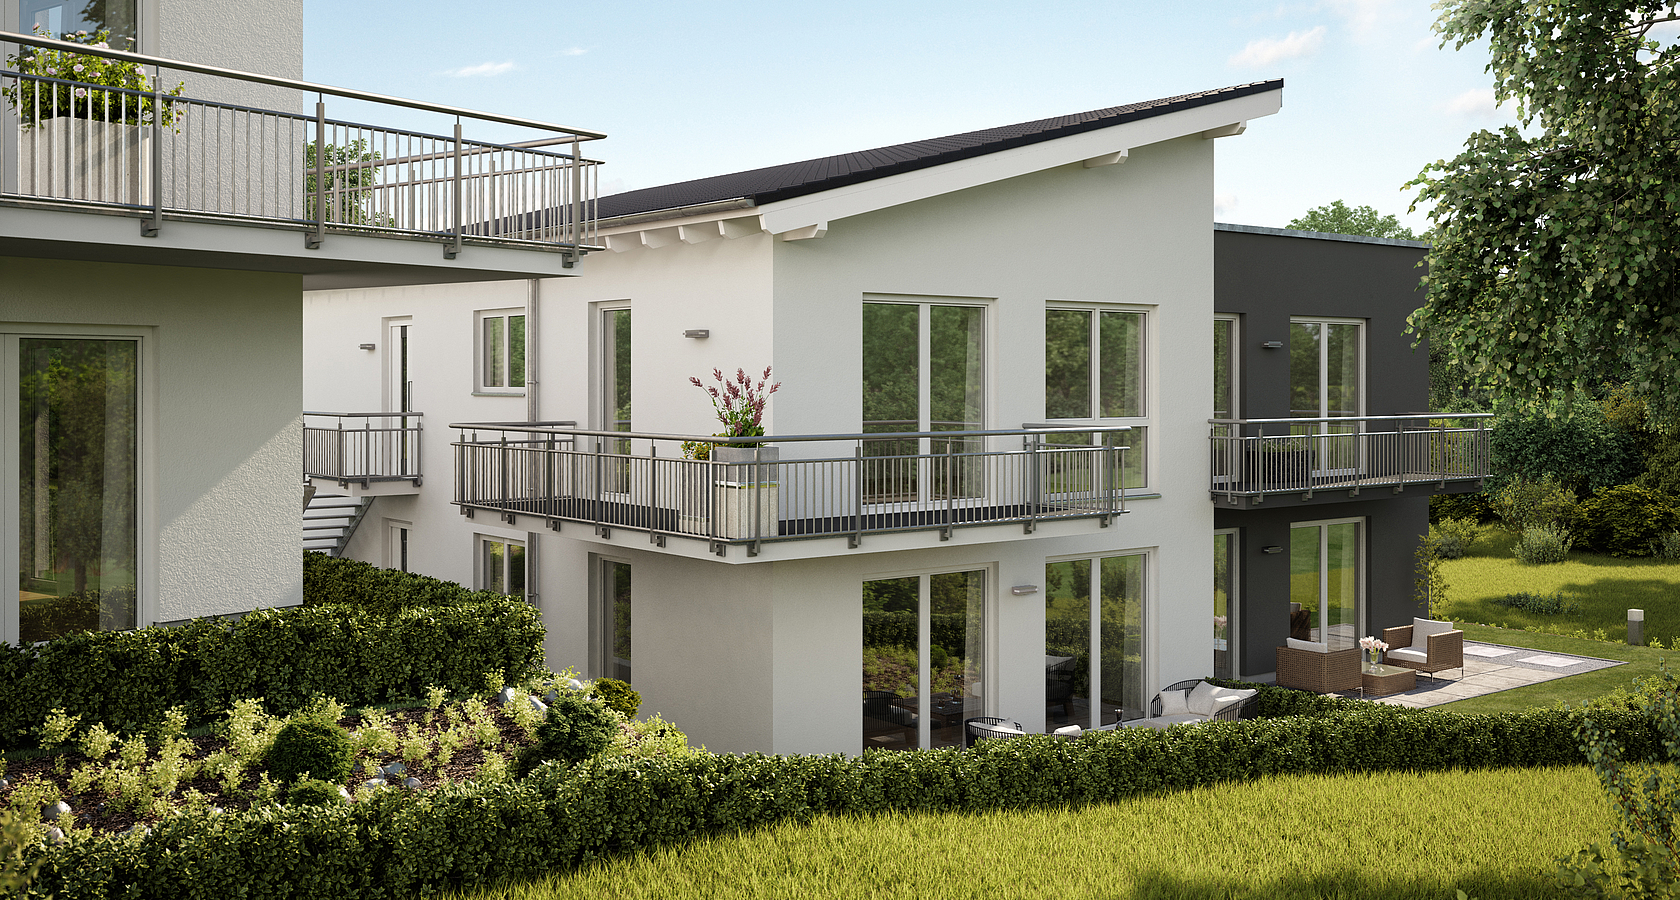 mehrfamilienhaus bauen individuell geplant kern haus. Black Bedroom Furniture Sets. Home Design Ideas